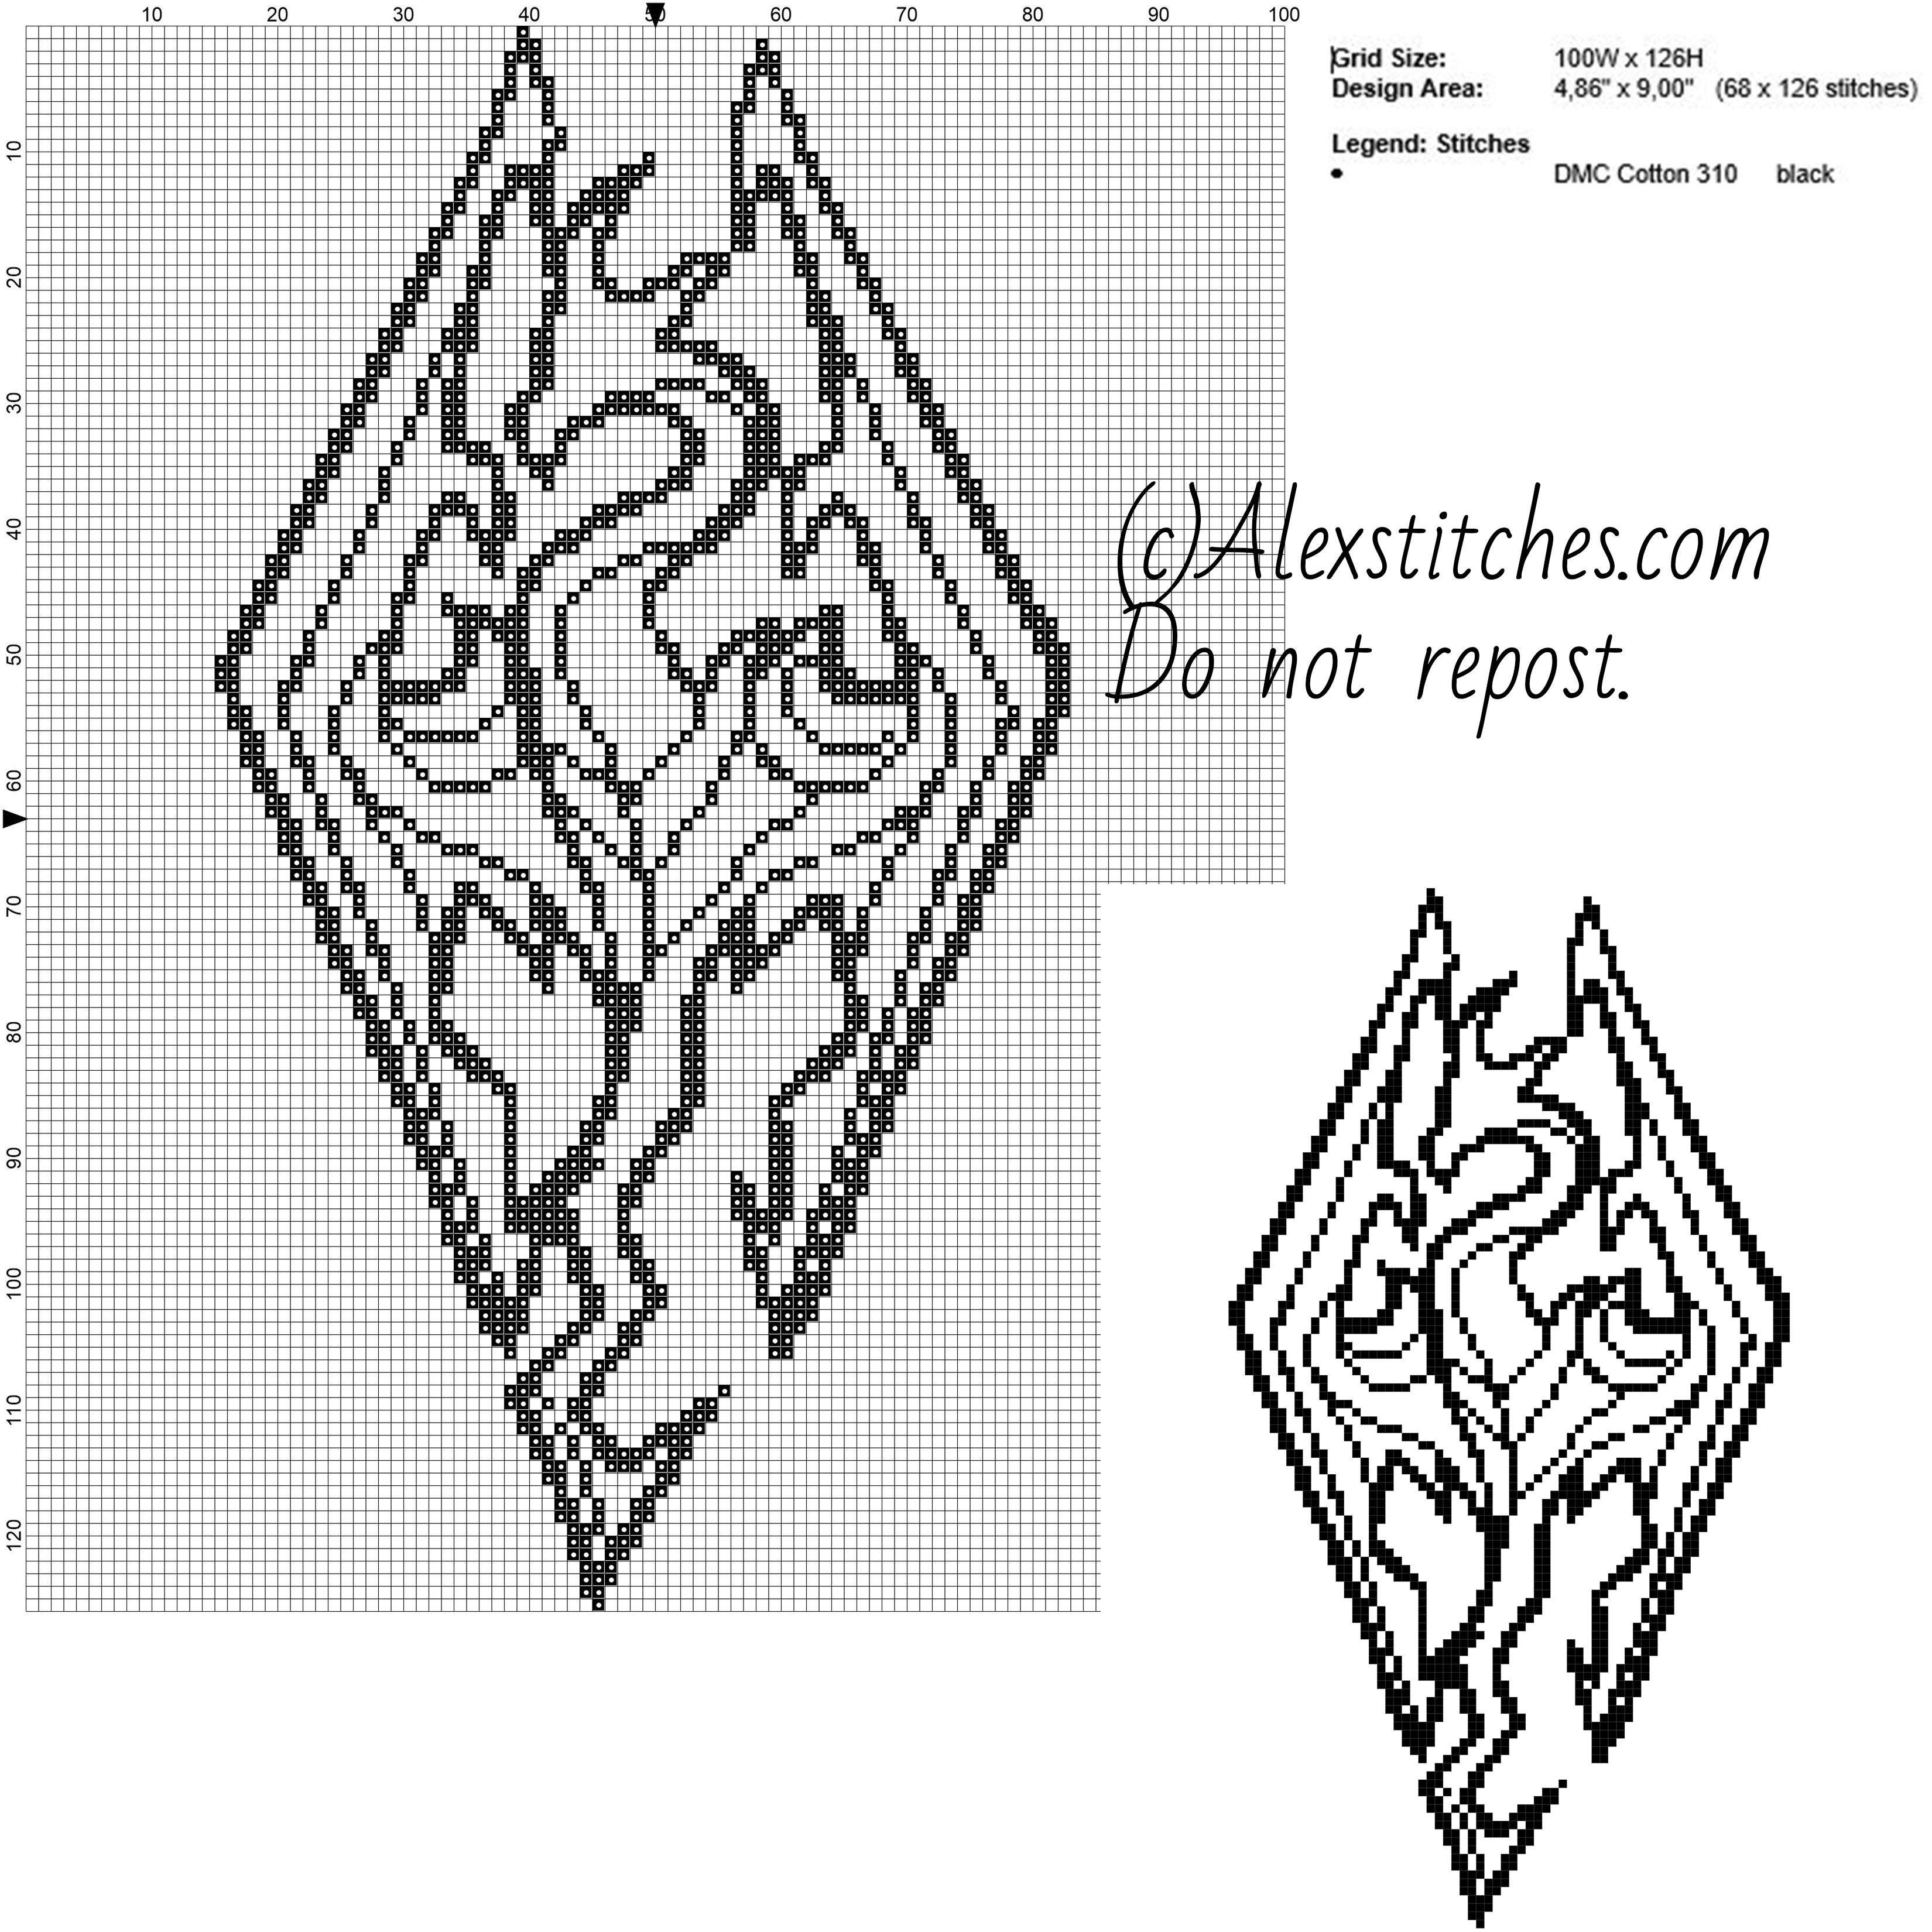 Pin de maria marenco en Dragones | Pinterest | Punto de cruz ...